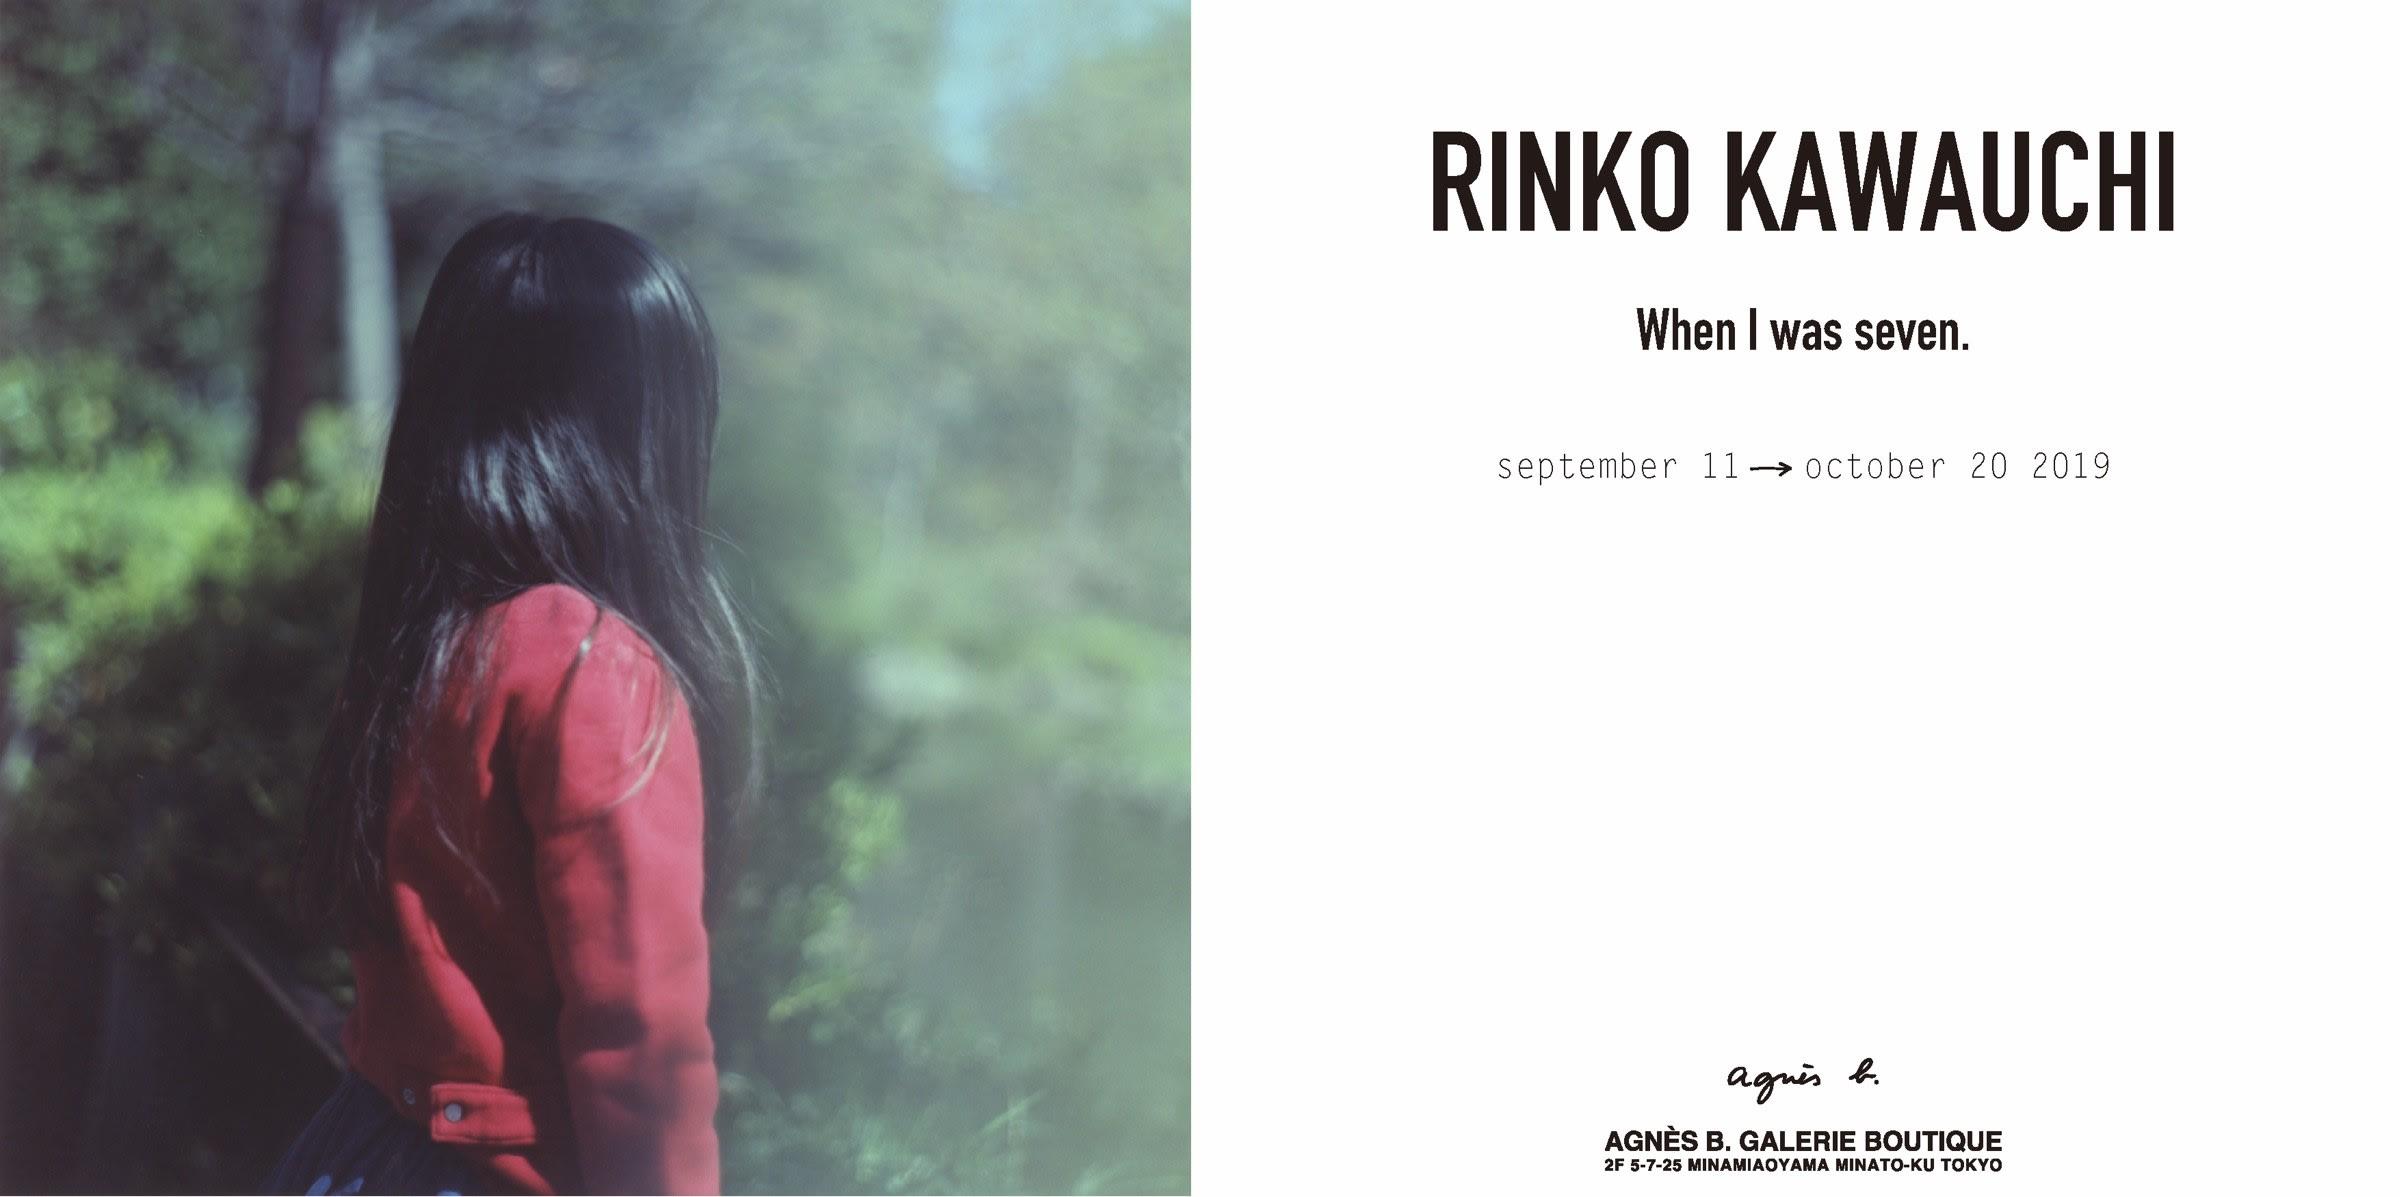 「「When I was seven.」rinko kawauchi」の画像検索結果